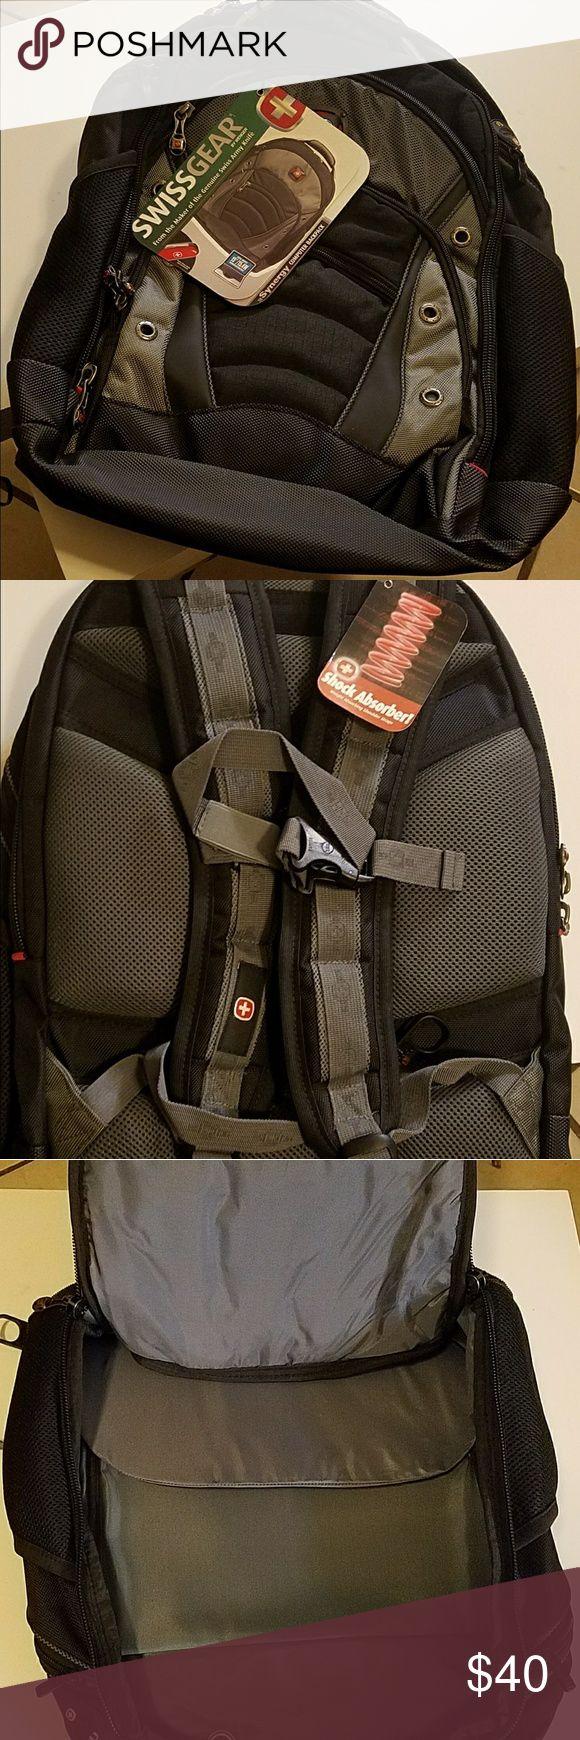 "Swissgear backpack Black/grey Swissgear backpack/computer bag. Will hold most lap tops 15""/15.4W widescreens. Very sturdy!! SwissGear Bags Backpacks"